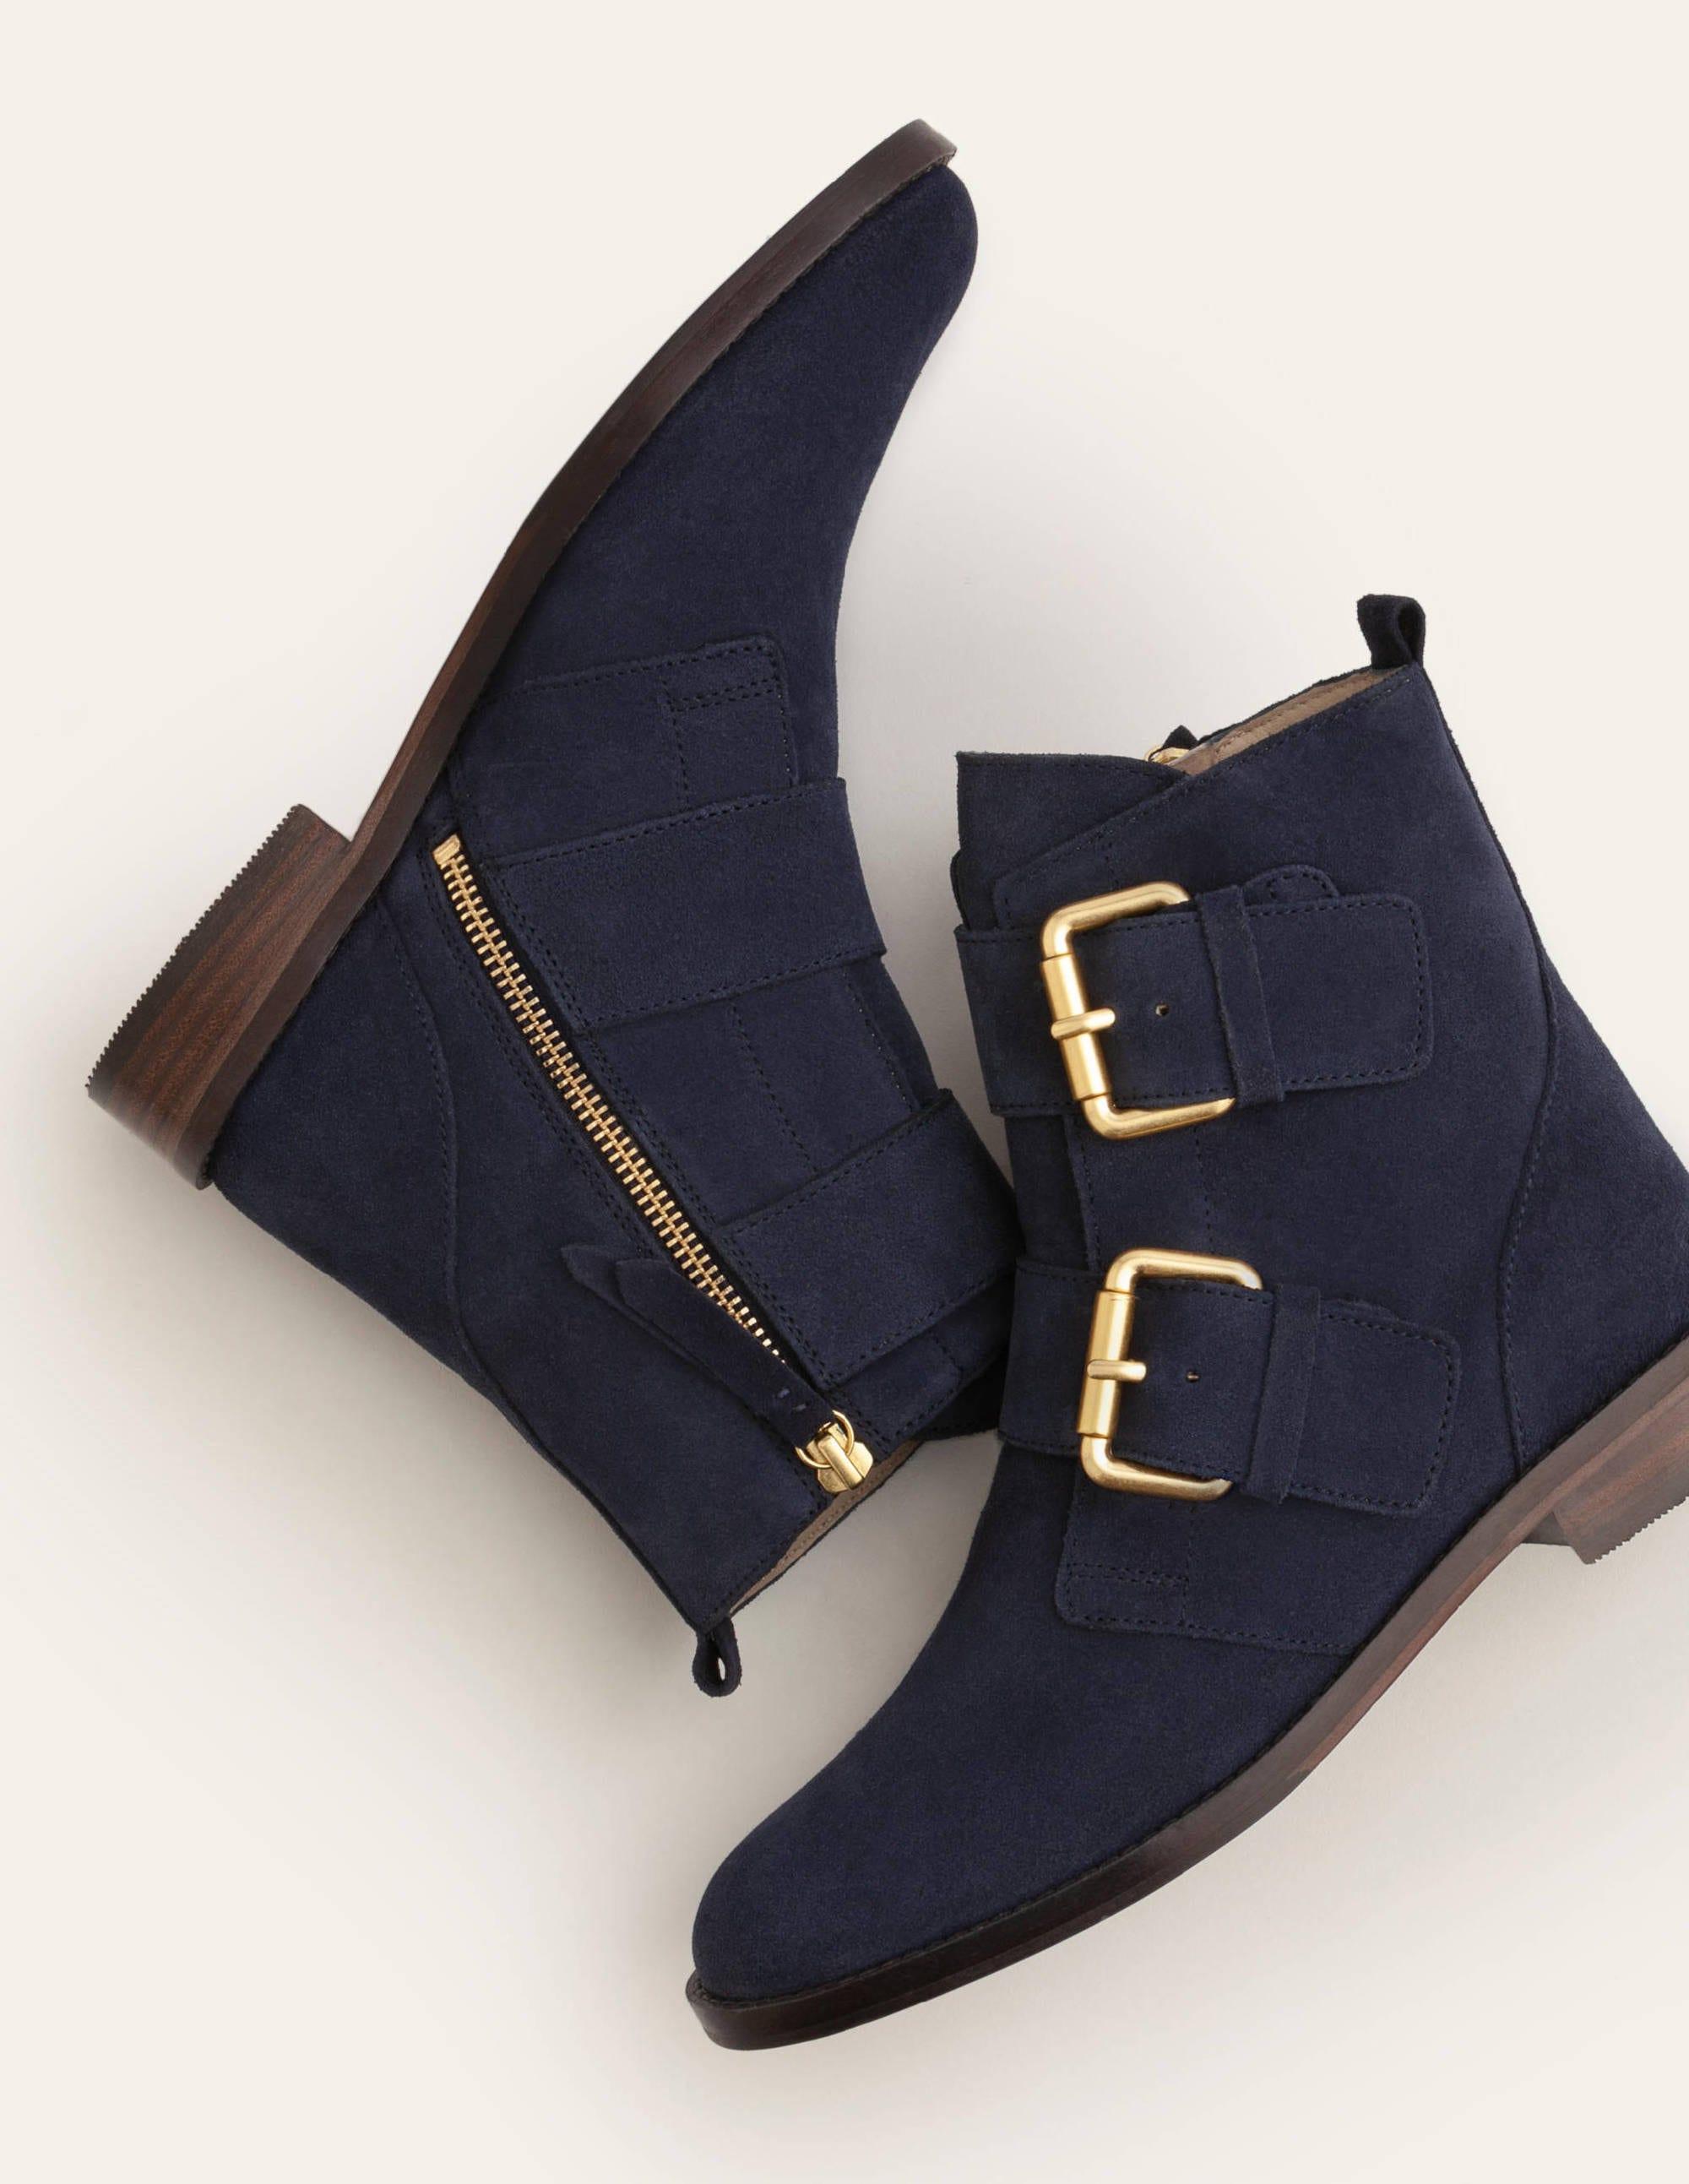 Cavenham Ankle Boots - Navy   Boden UK